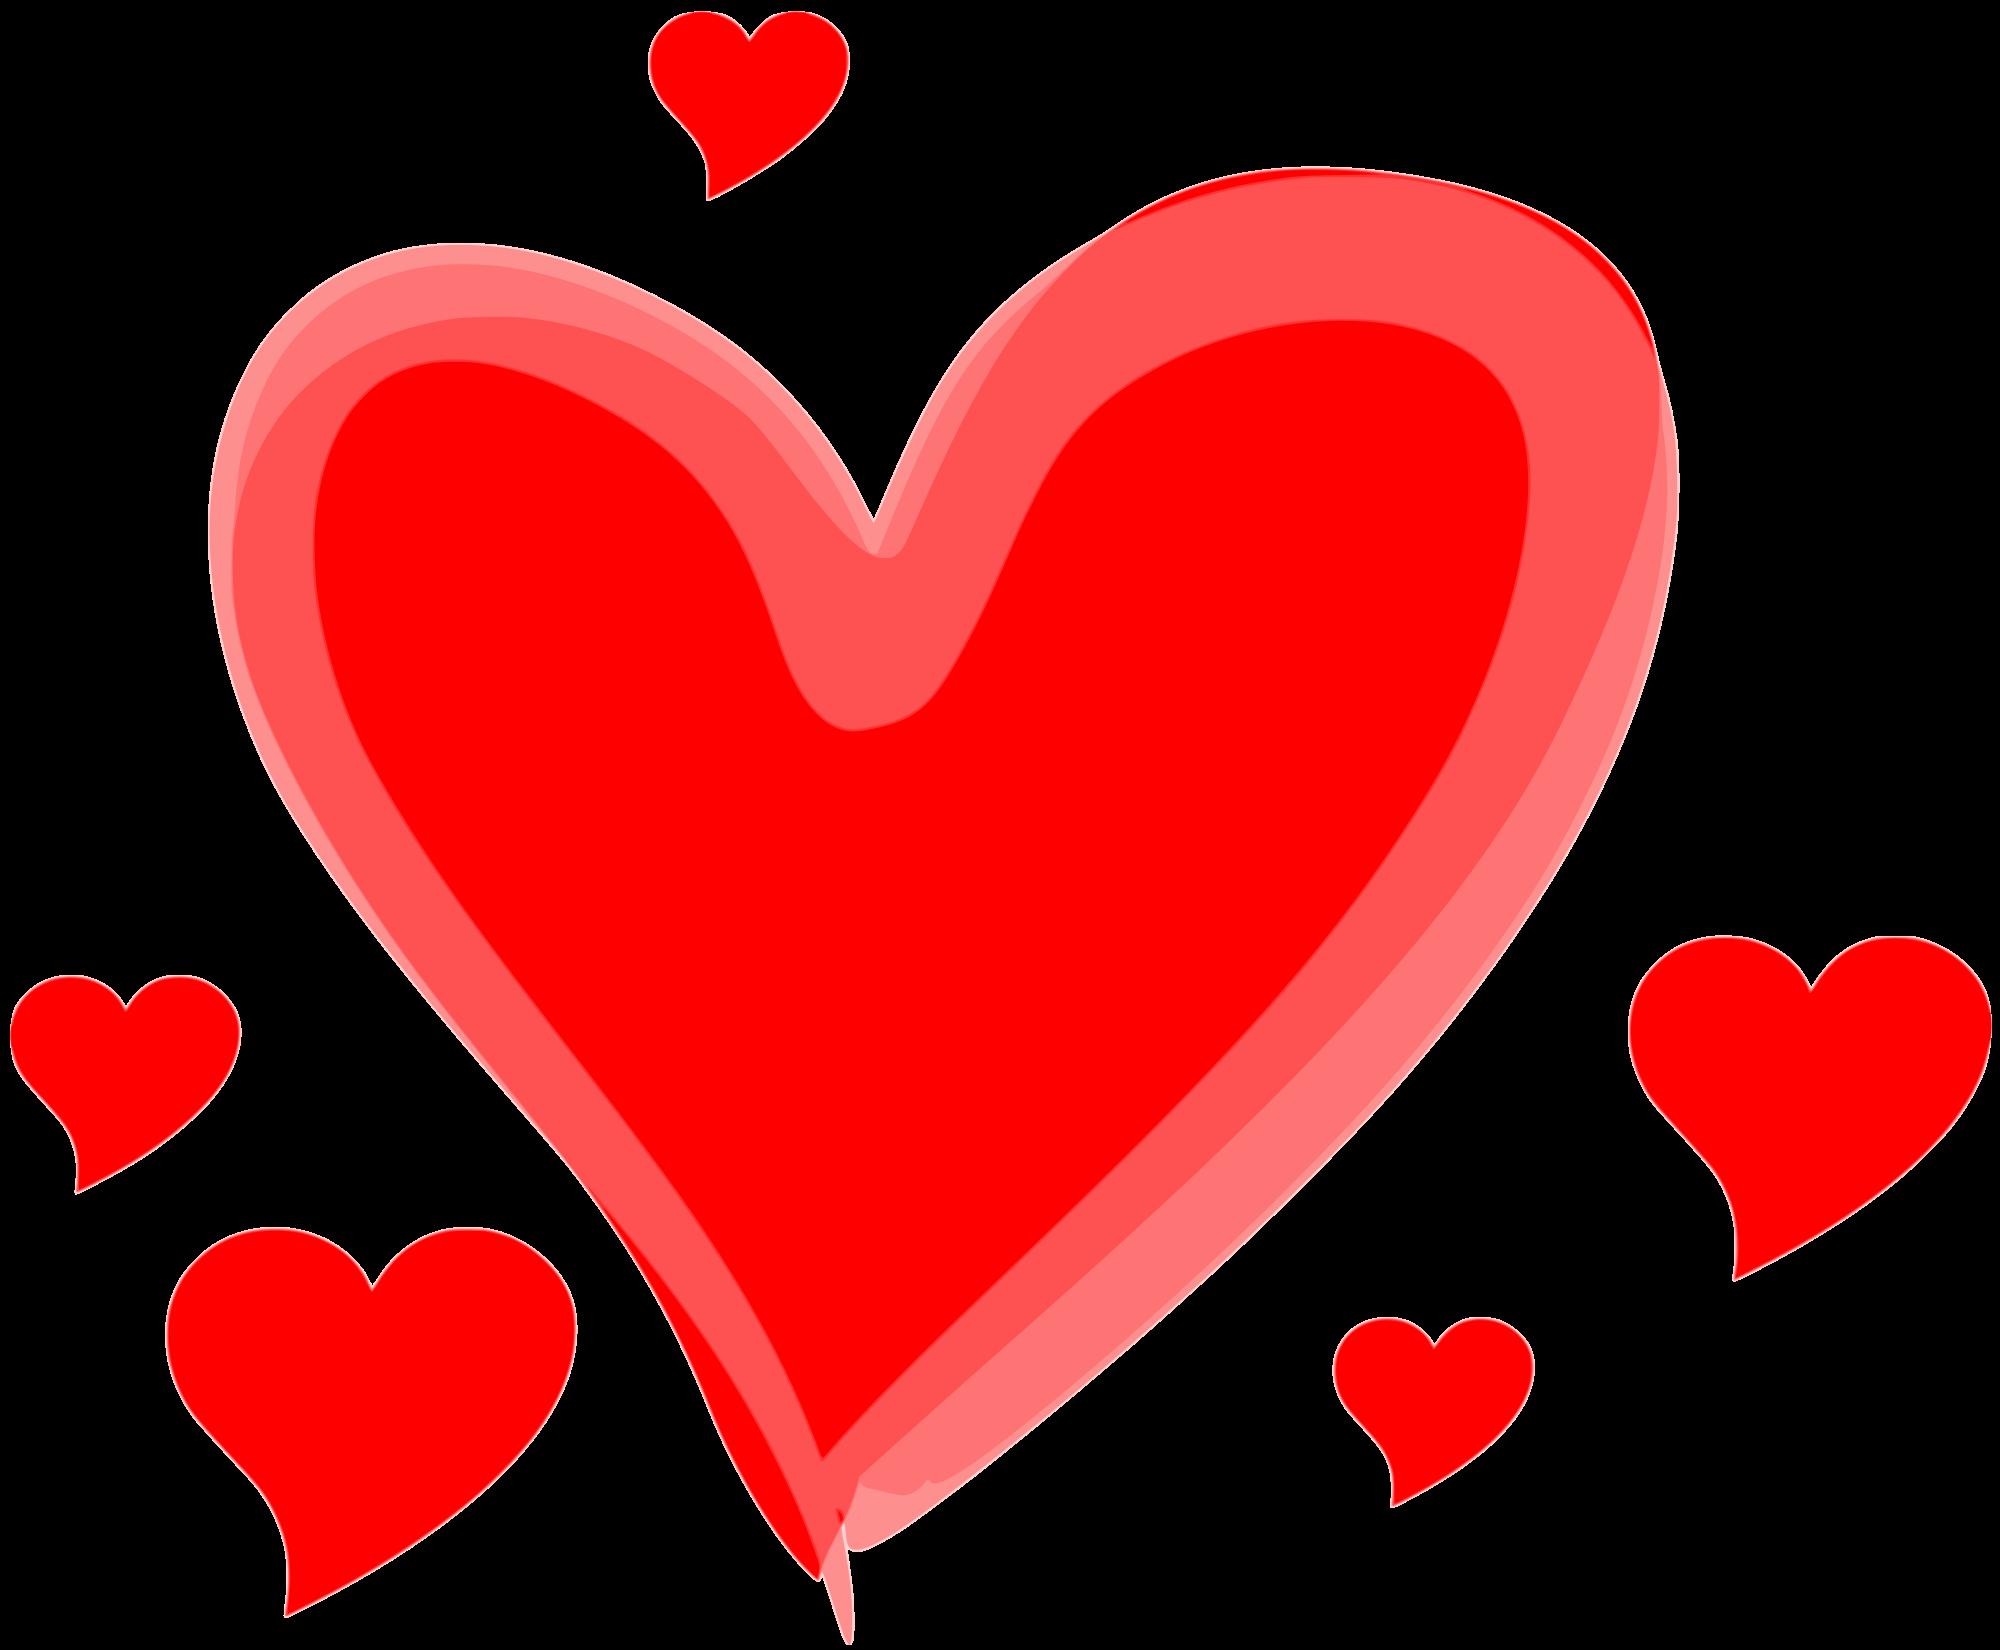 File drawn svg wikipedia. Love hearts png